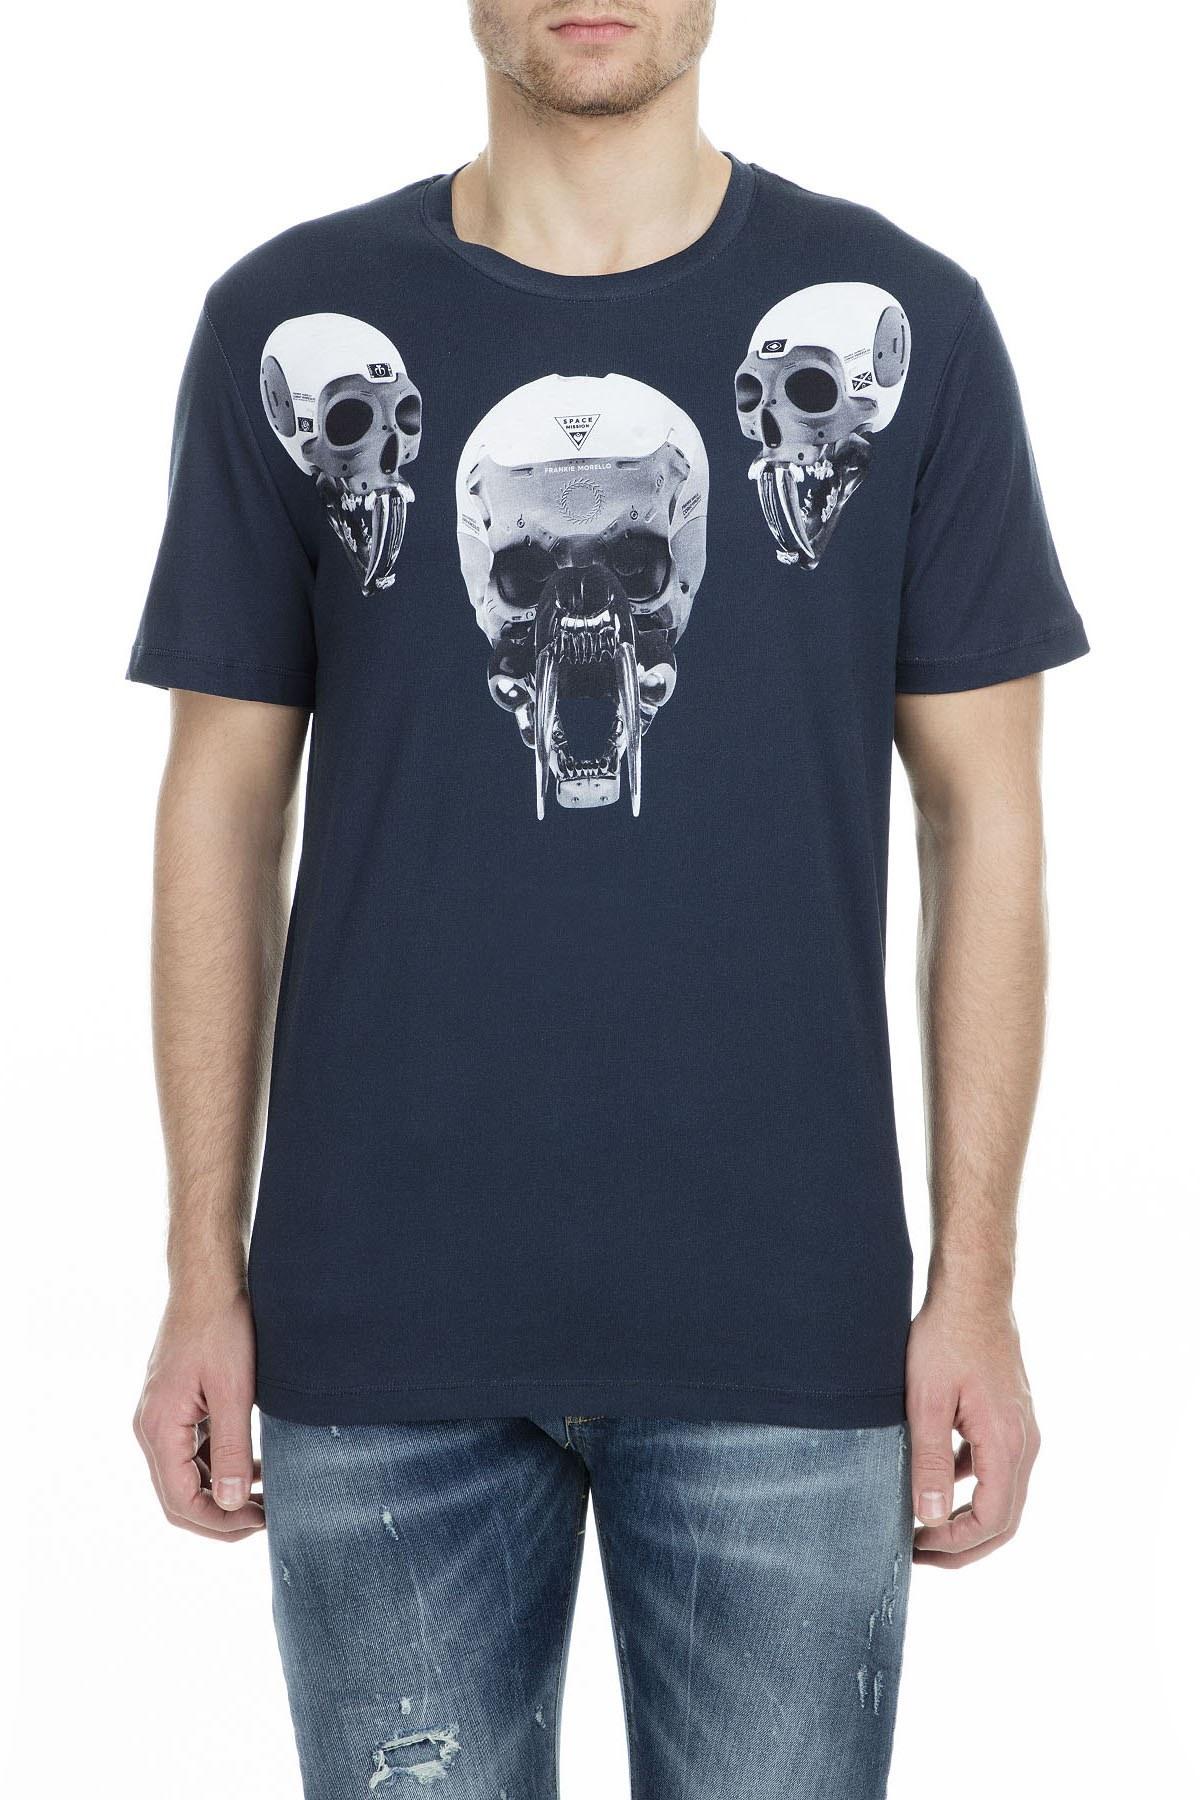 Frankie Morello Erkek T Shirt FMCS9148TS B01 LACİVERT